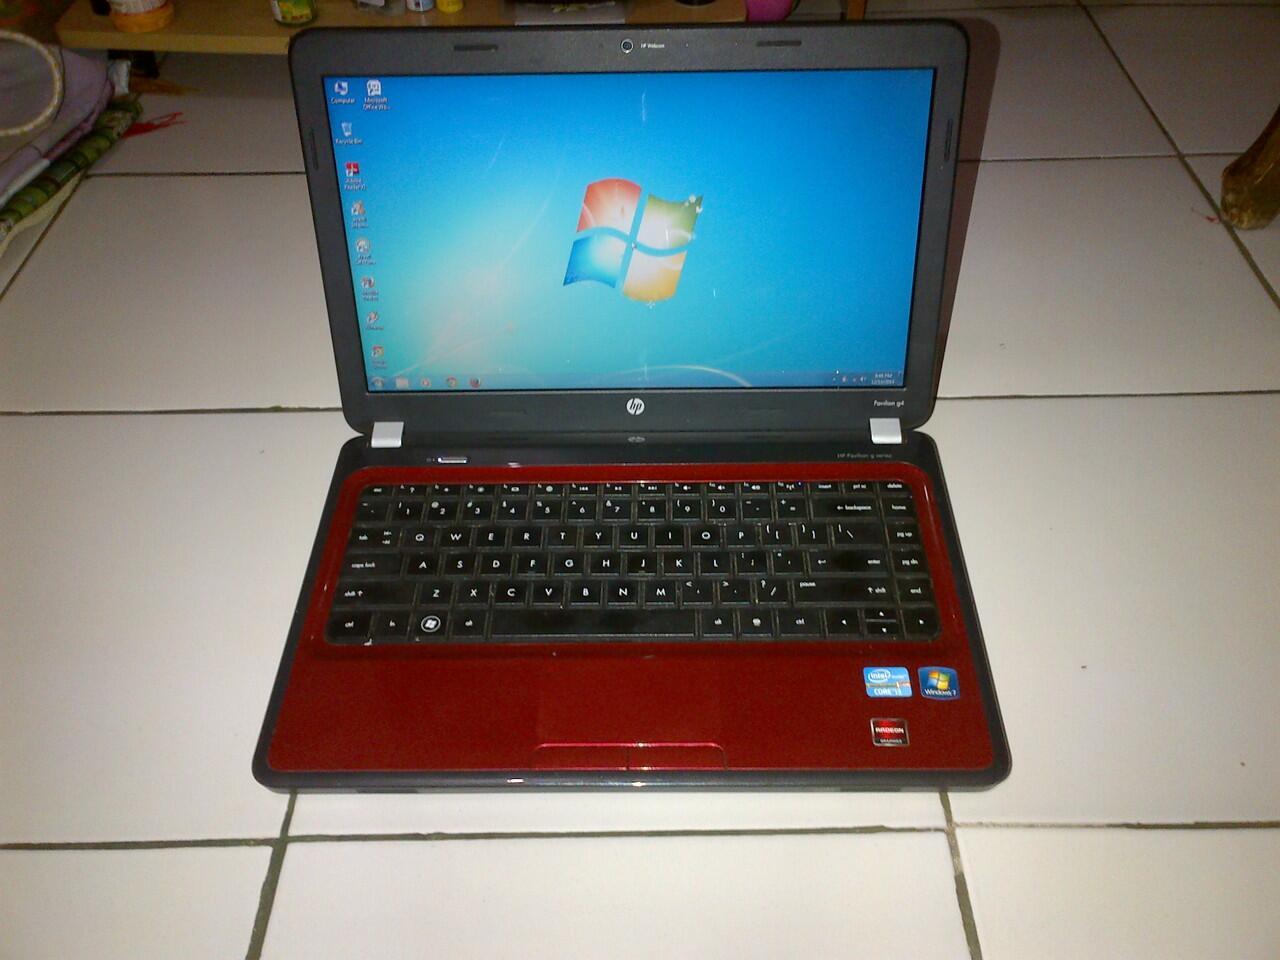 Jual Laptop HP Pavilion Core i 3, Ram 4 gb, Hdd 500gb, Murah Aja